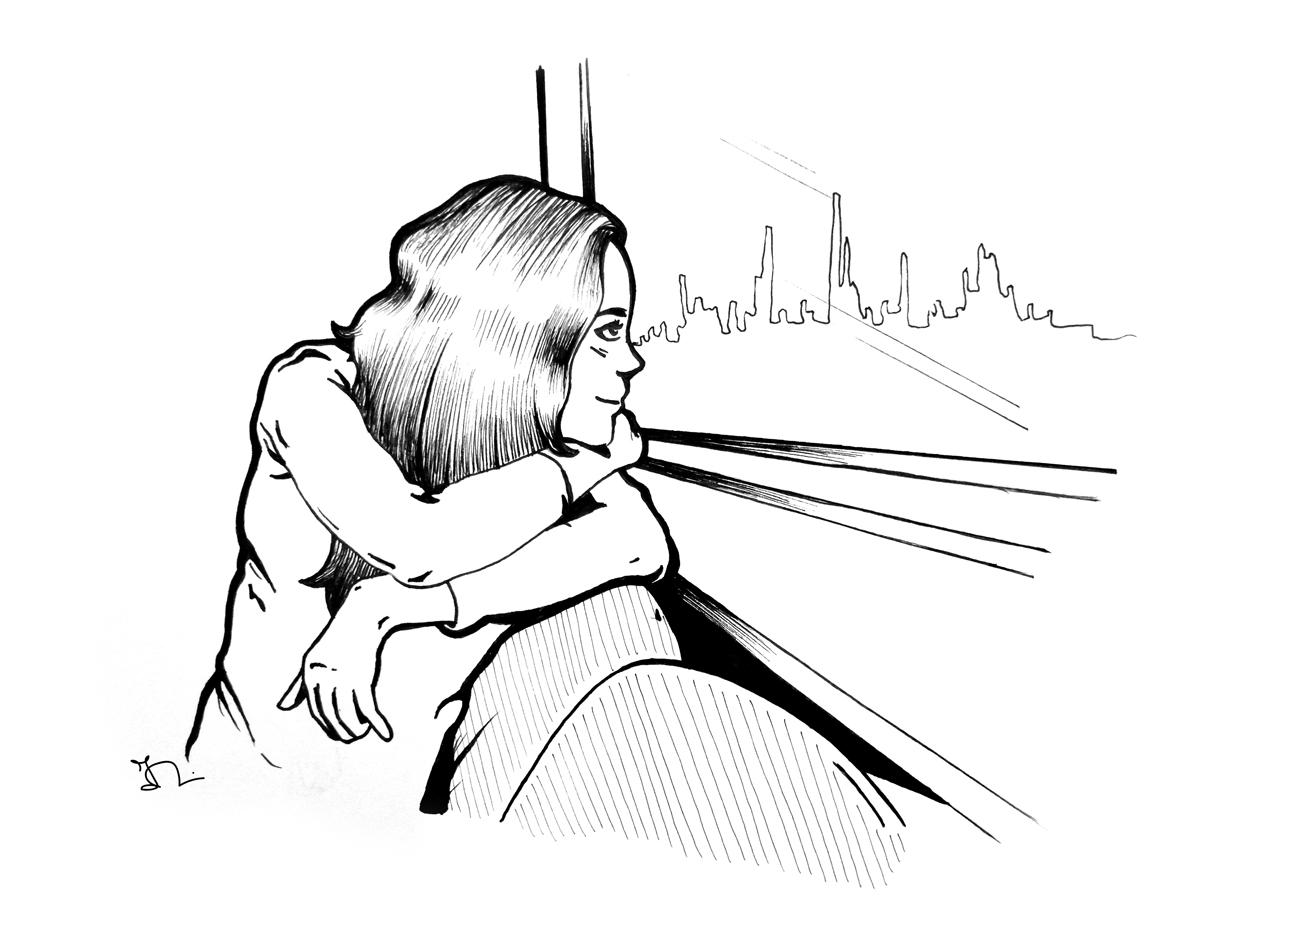 Ilaria mori illustration